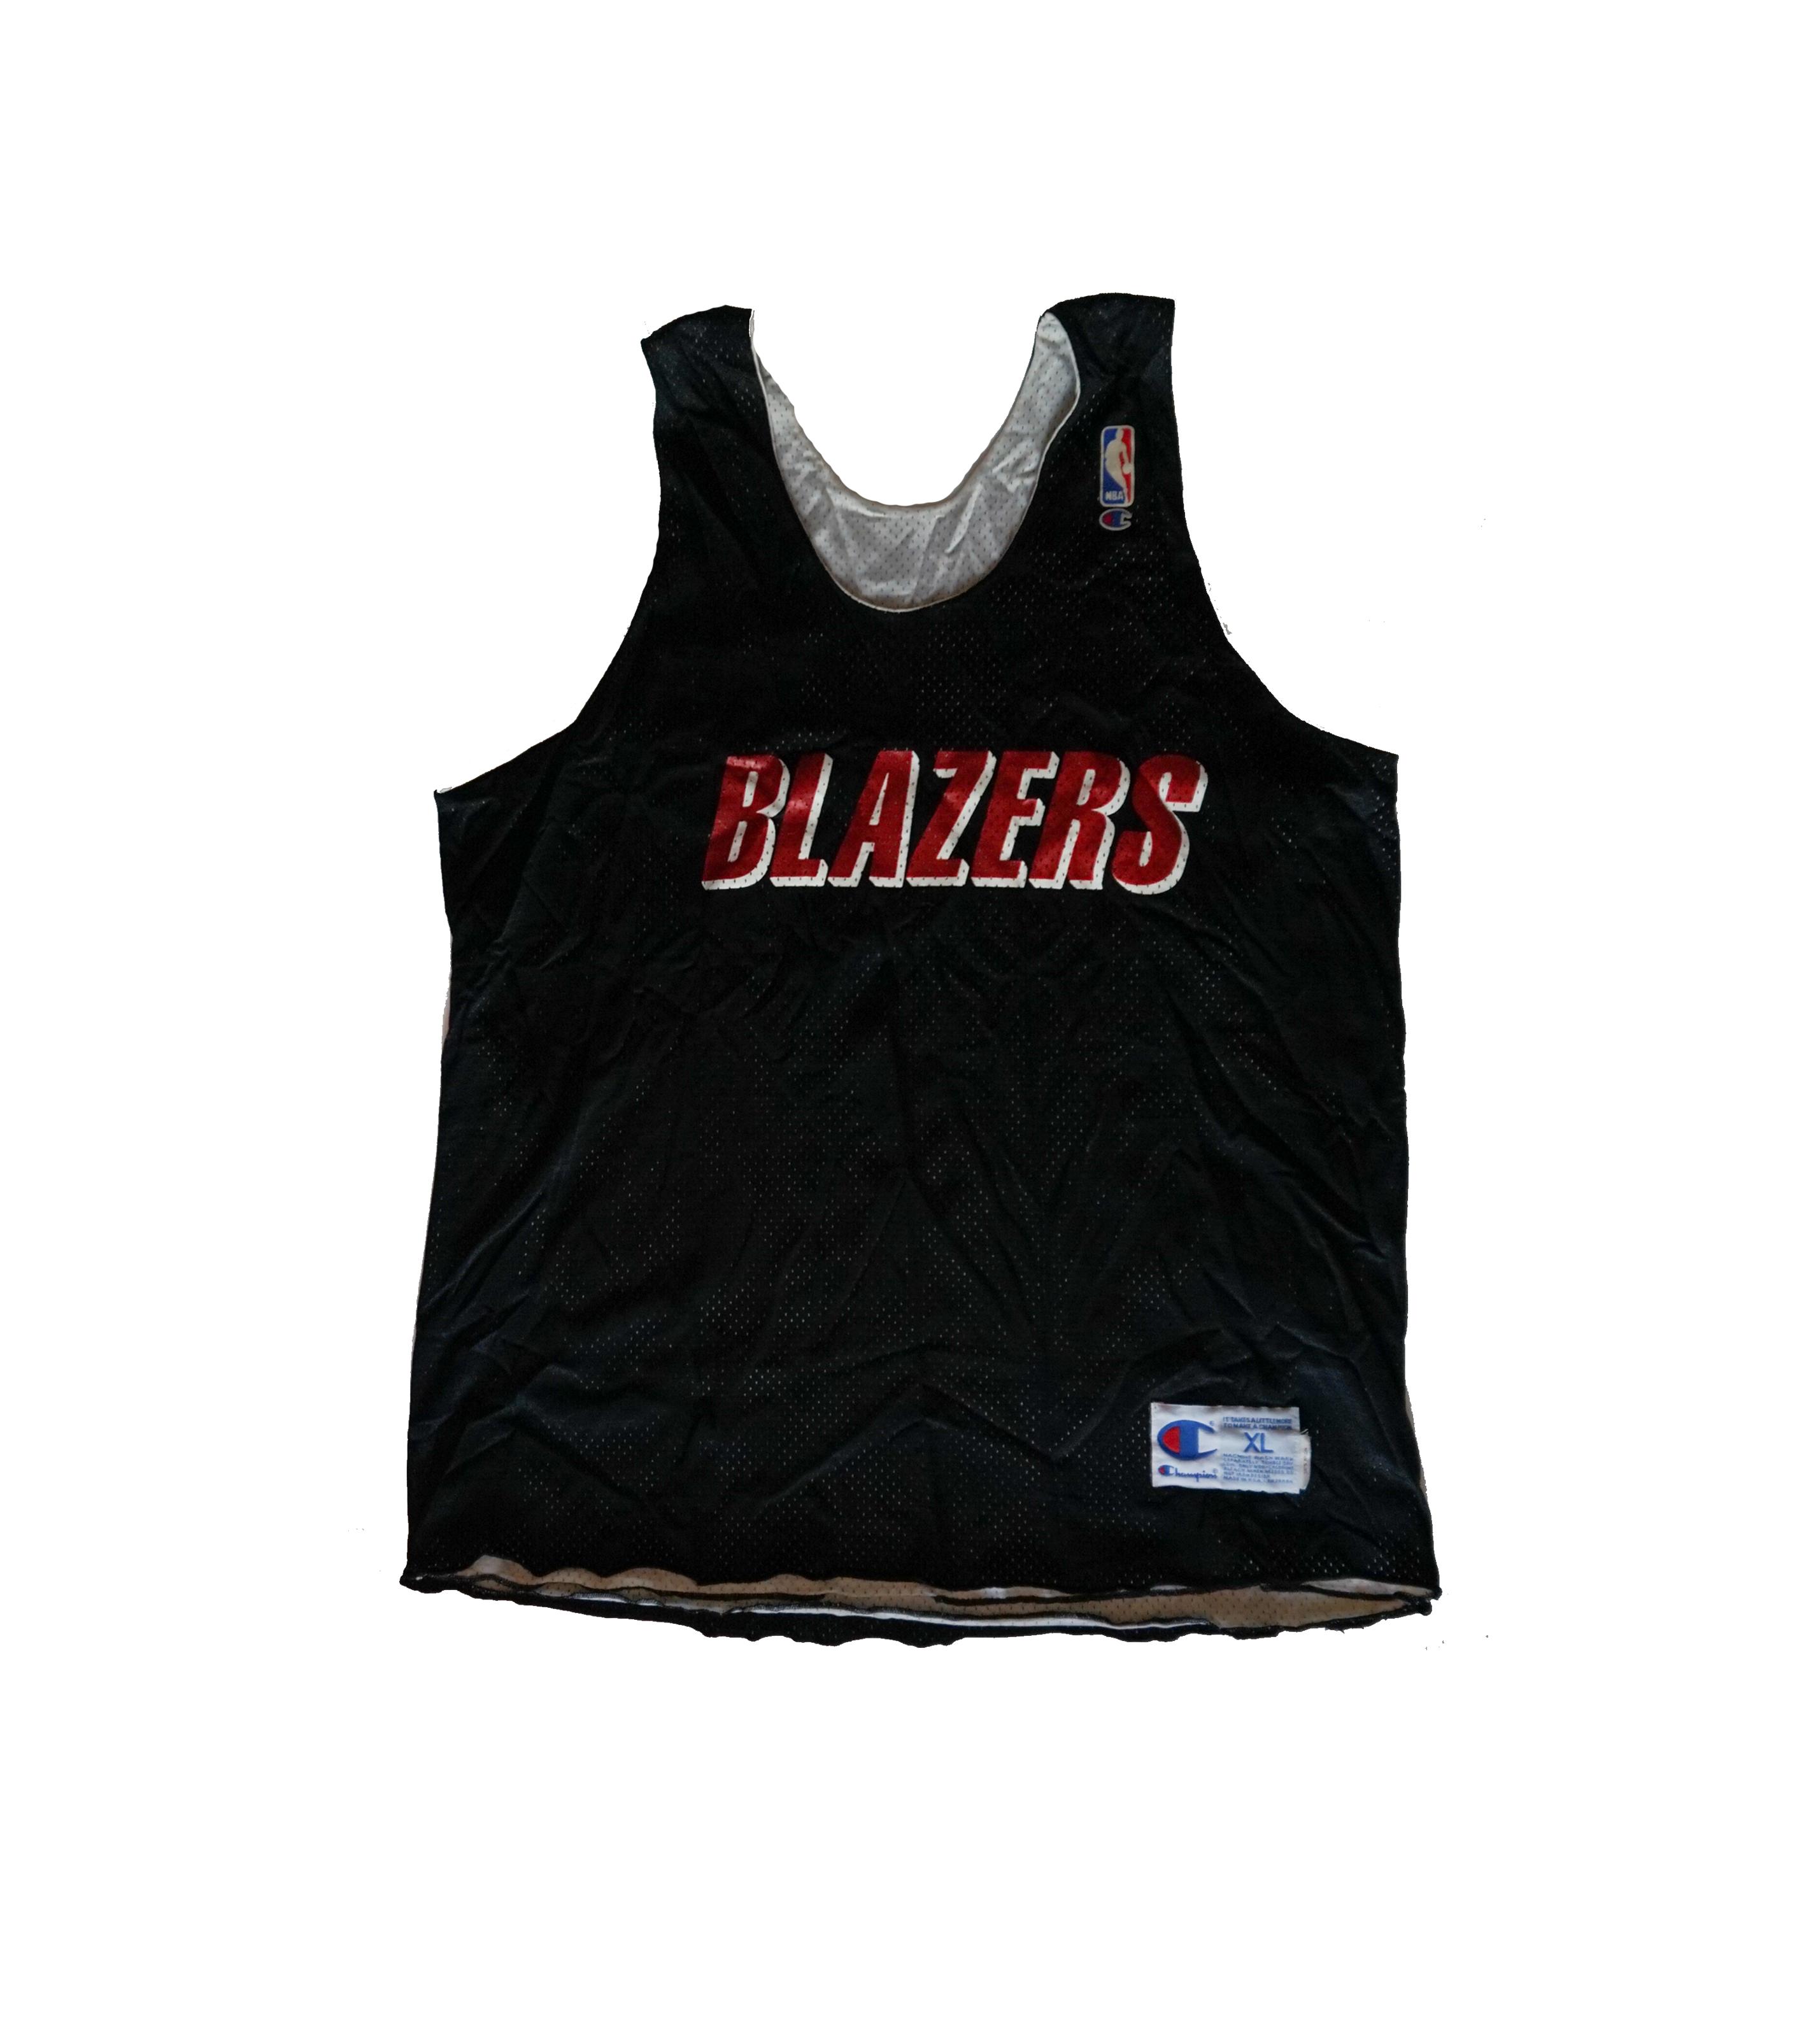 Blazers Reversible Jersey